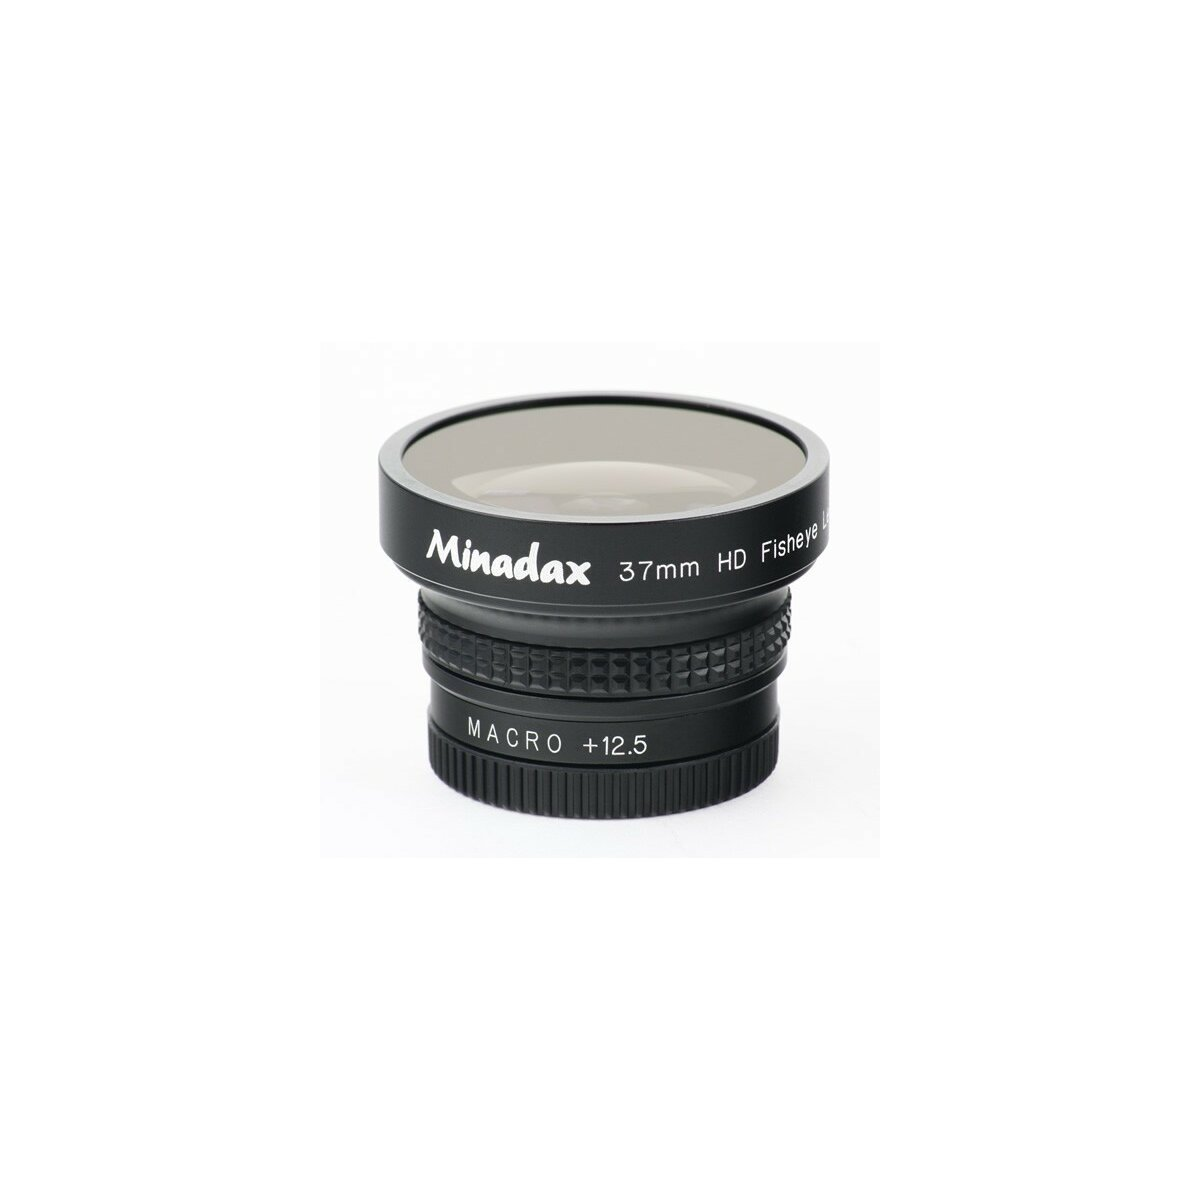 Minadax 0.42x Fisheye Vorsatz kompatibel mit Canon HV10, HR10, HF10, HF11, HG20, HG21, DC40, DC50, HF100, LEGRIA HF20, LEGRIA HF21, LEGRIA HF200, LEGRIA HF M31, LEGRIA HF M32, LEGRIA HF M36